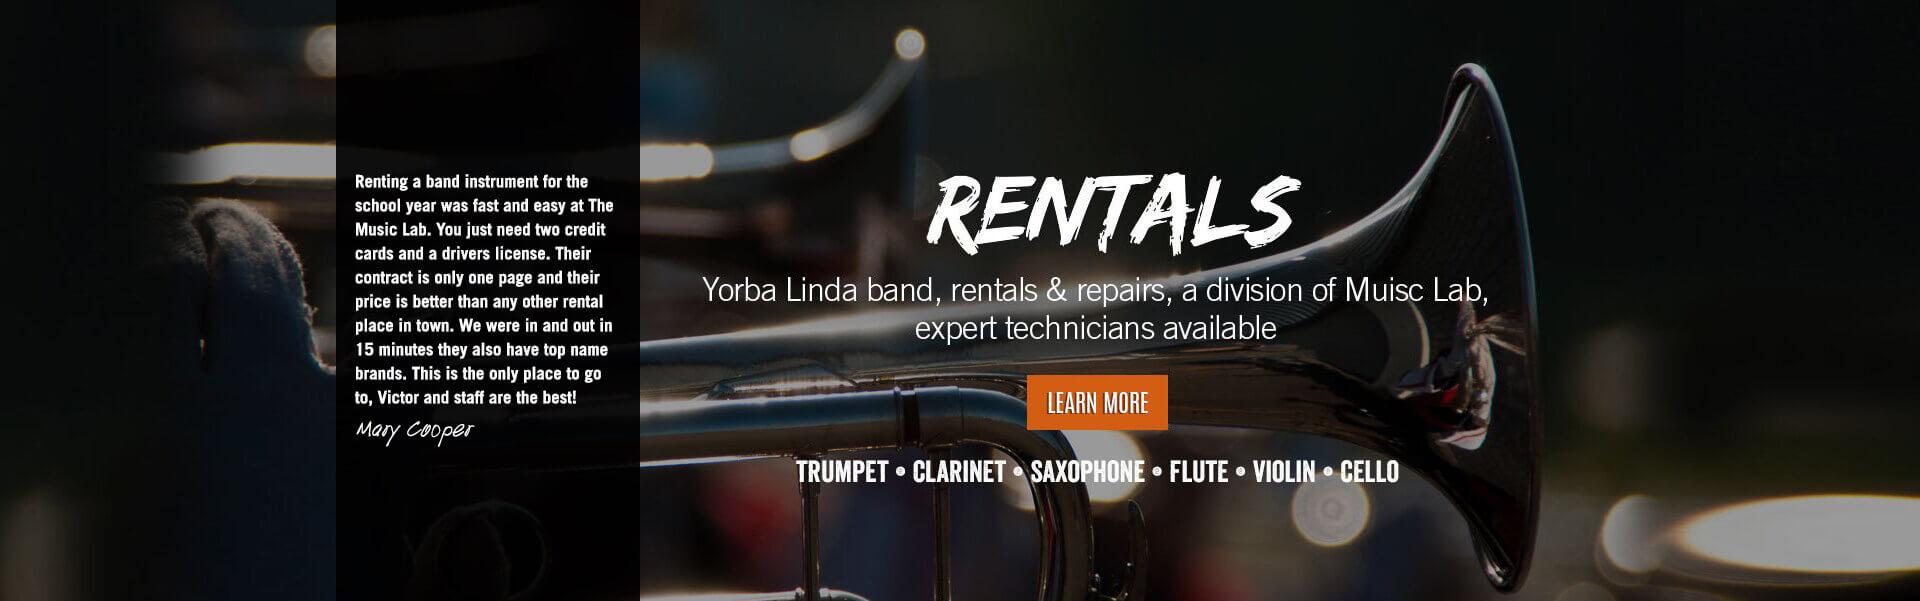 Music Store Yorba Linda